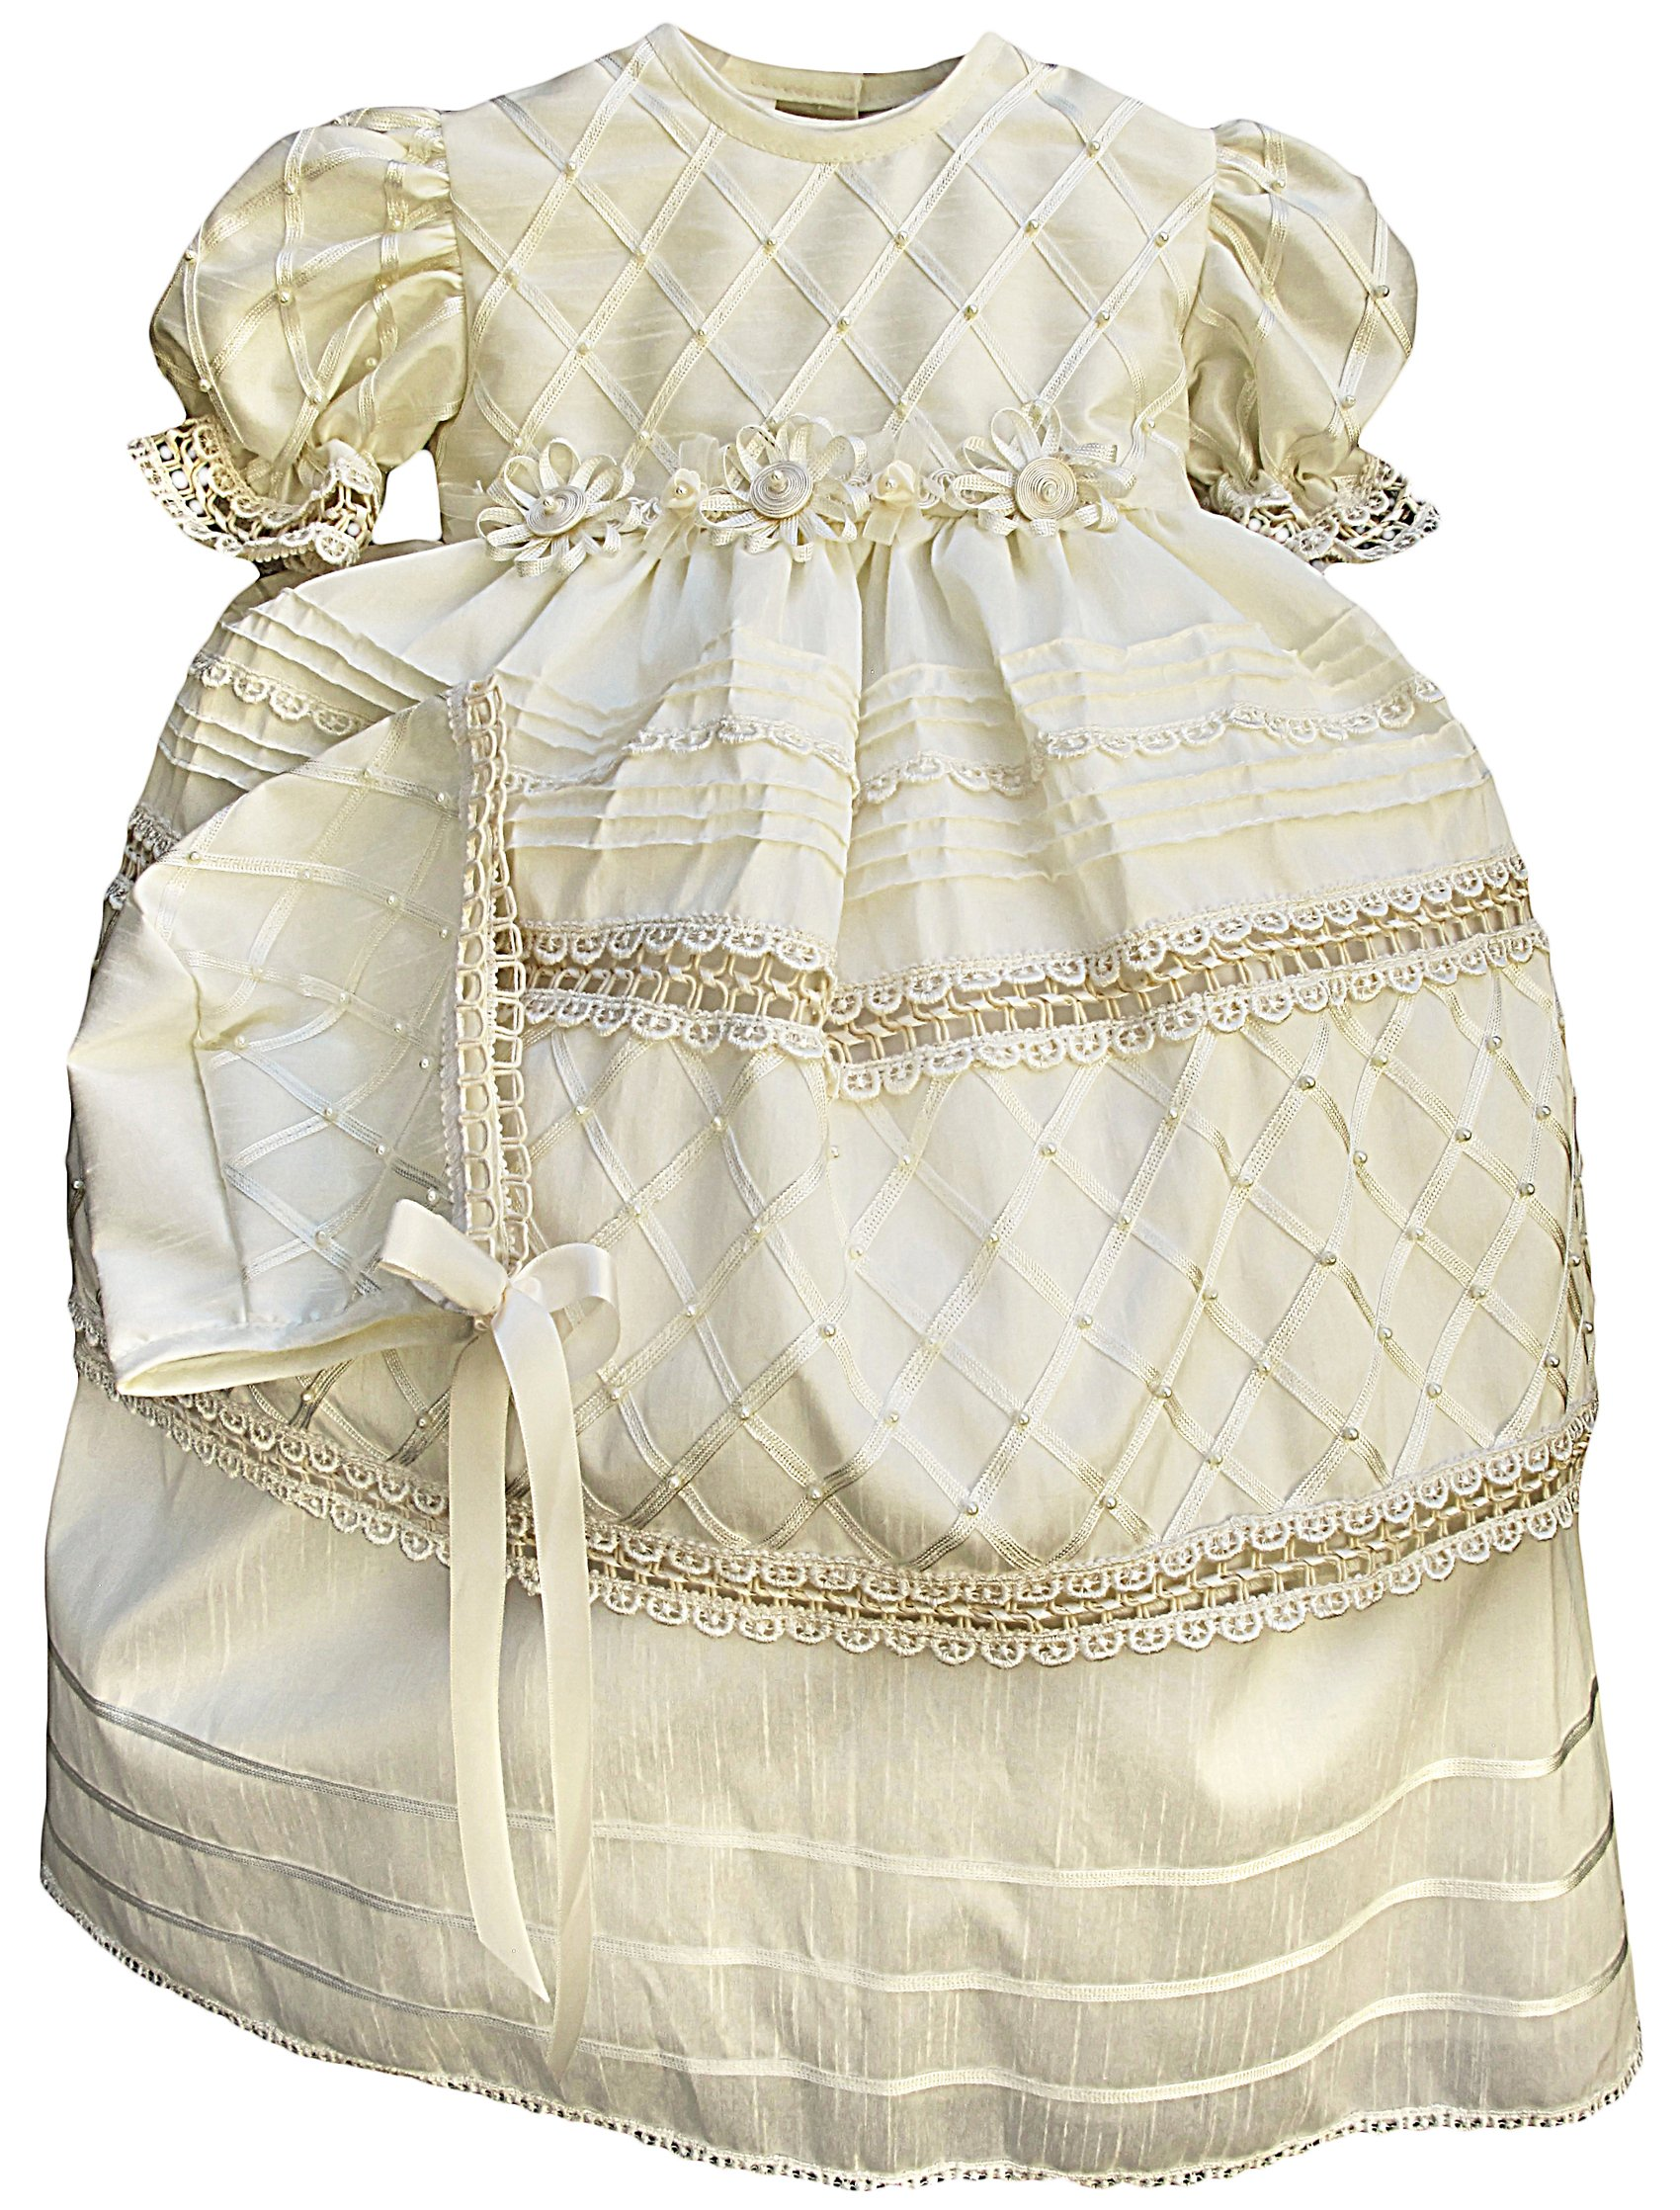 Baby-girls Heirloom Christening Baptism Gown Dress (Burbvus Ropones) Handmade - Silk by Burbvus (Image #6)